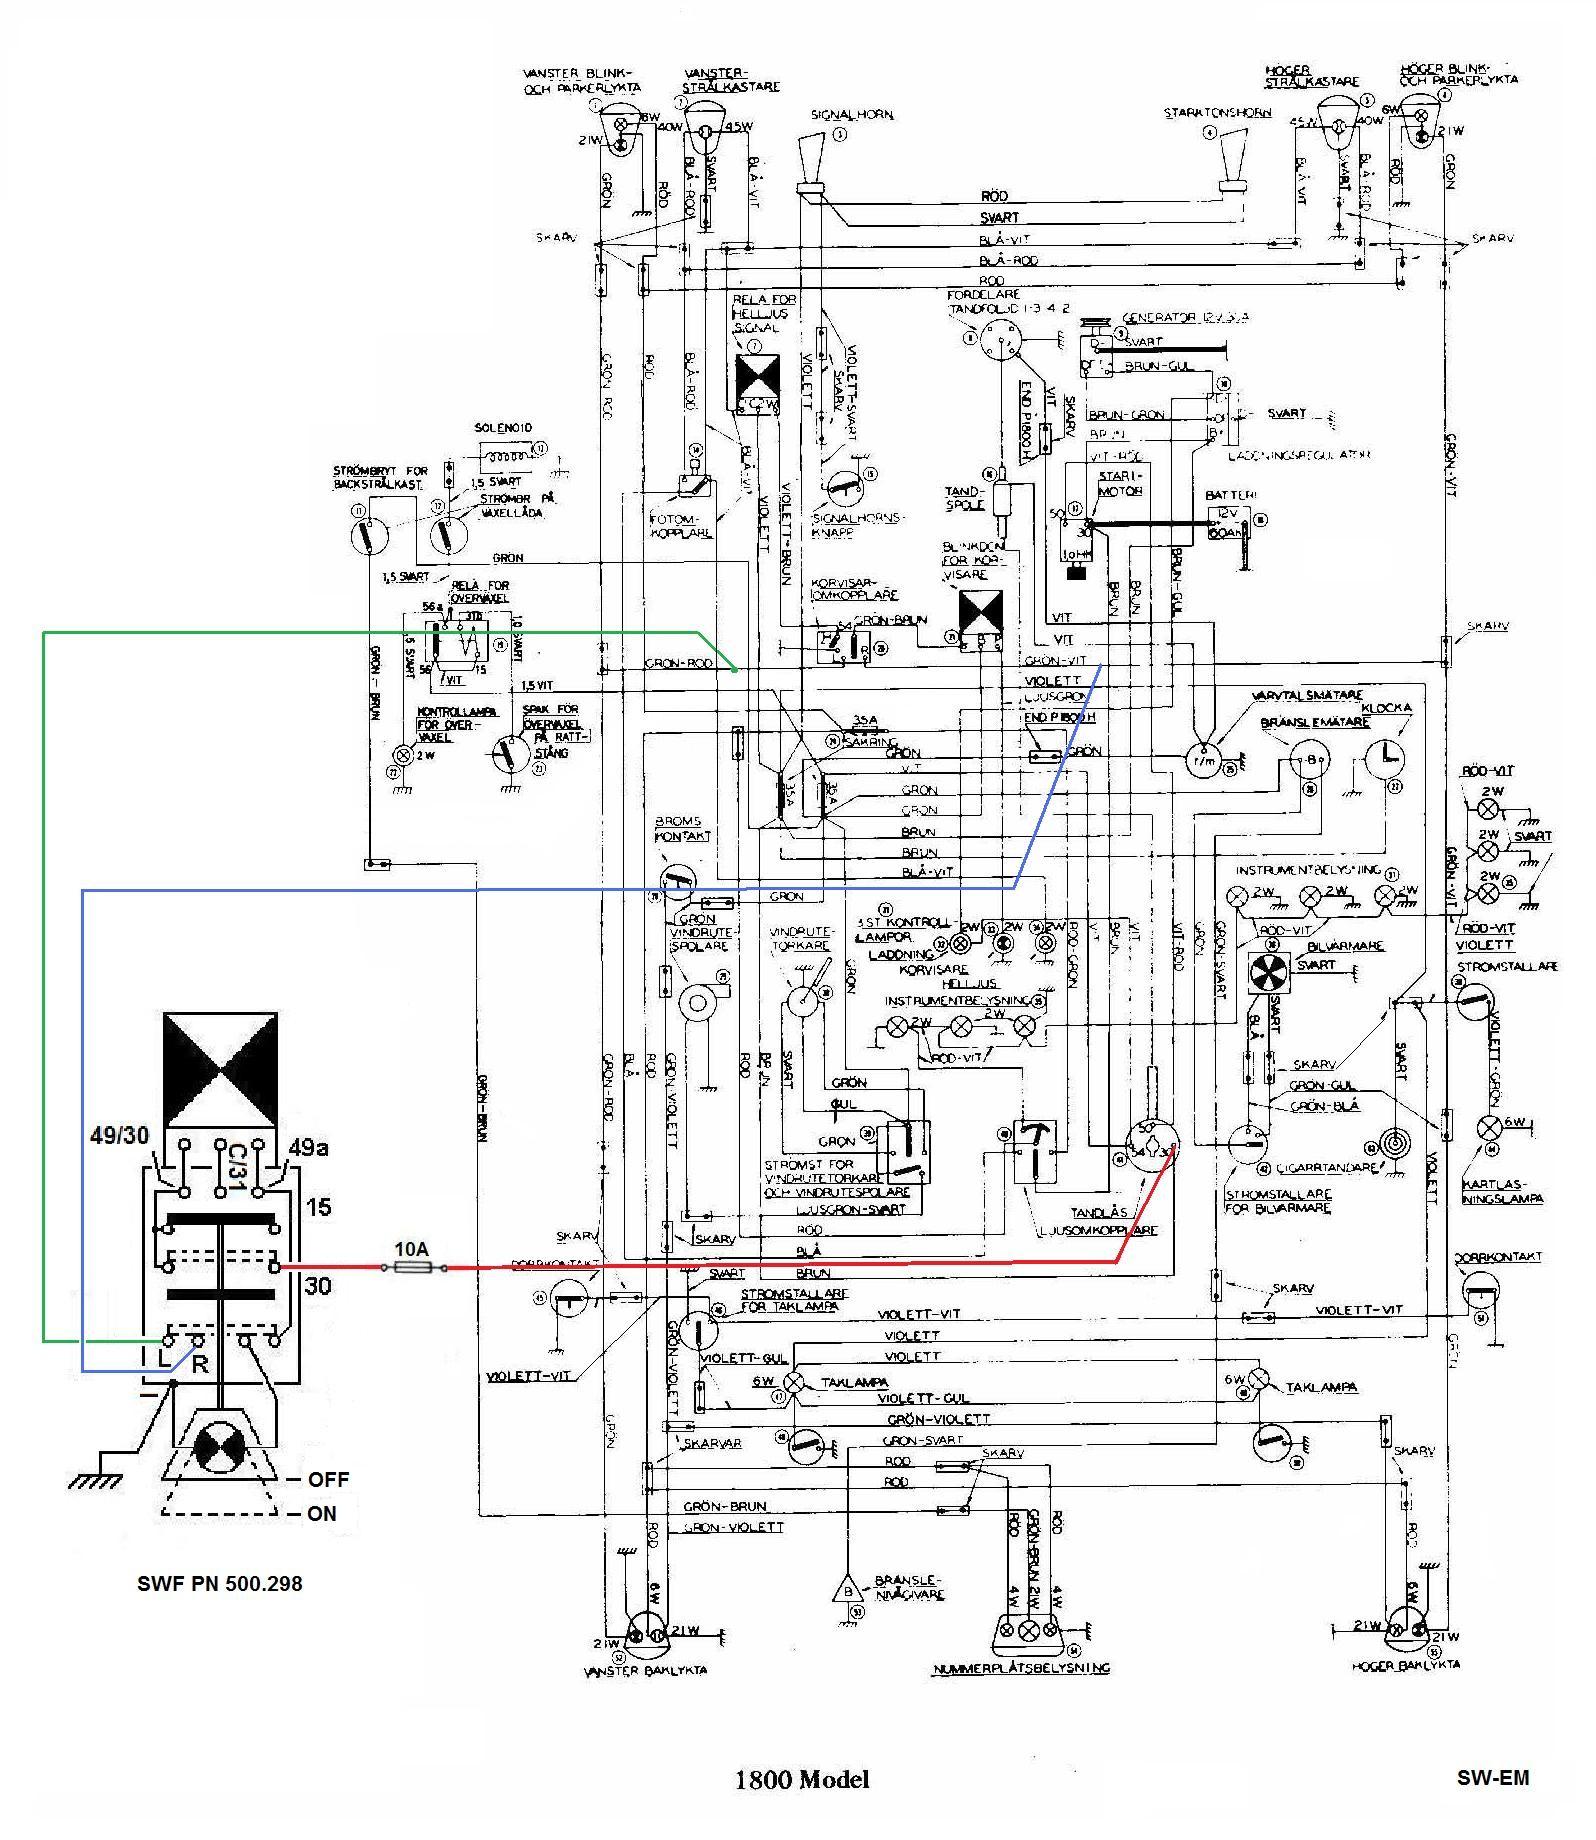 Wiring A 3 Prong Flasher Sw Em Emergency Flasher Of Wiring A 3 Prong Flasher